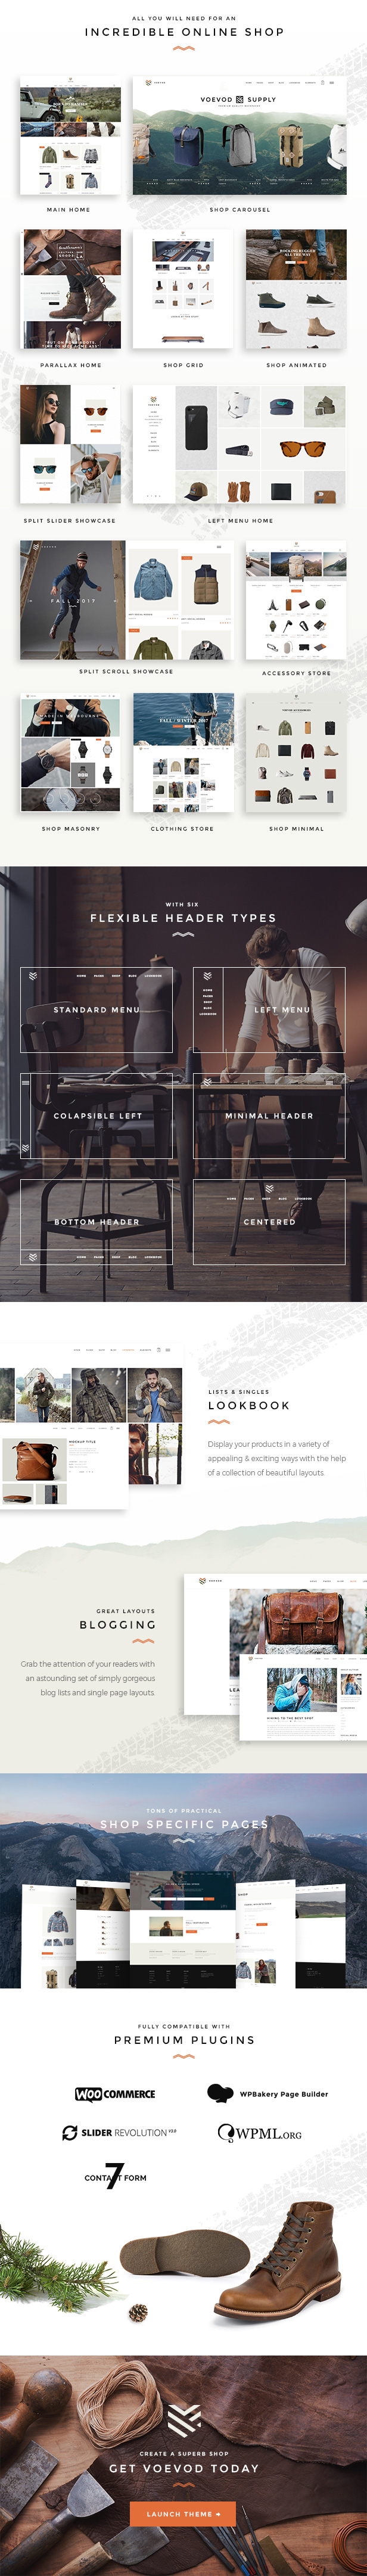 Voevod - WooCommerce Store - 2